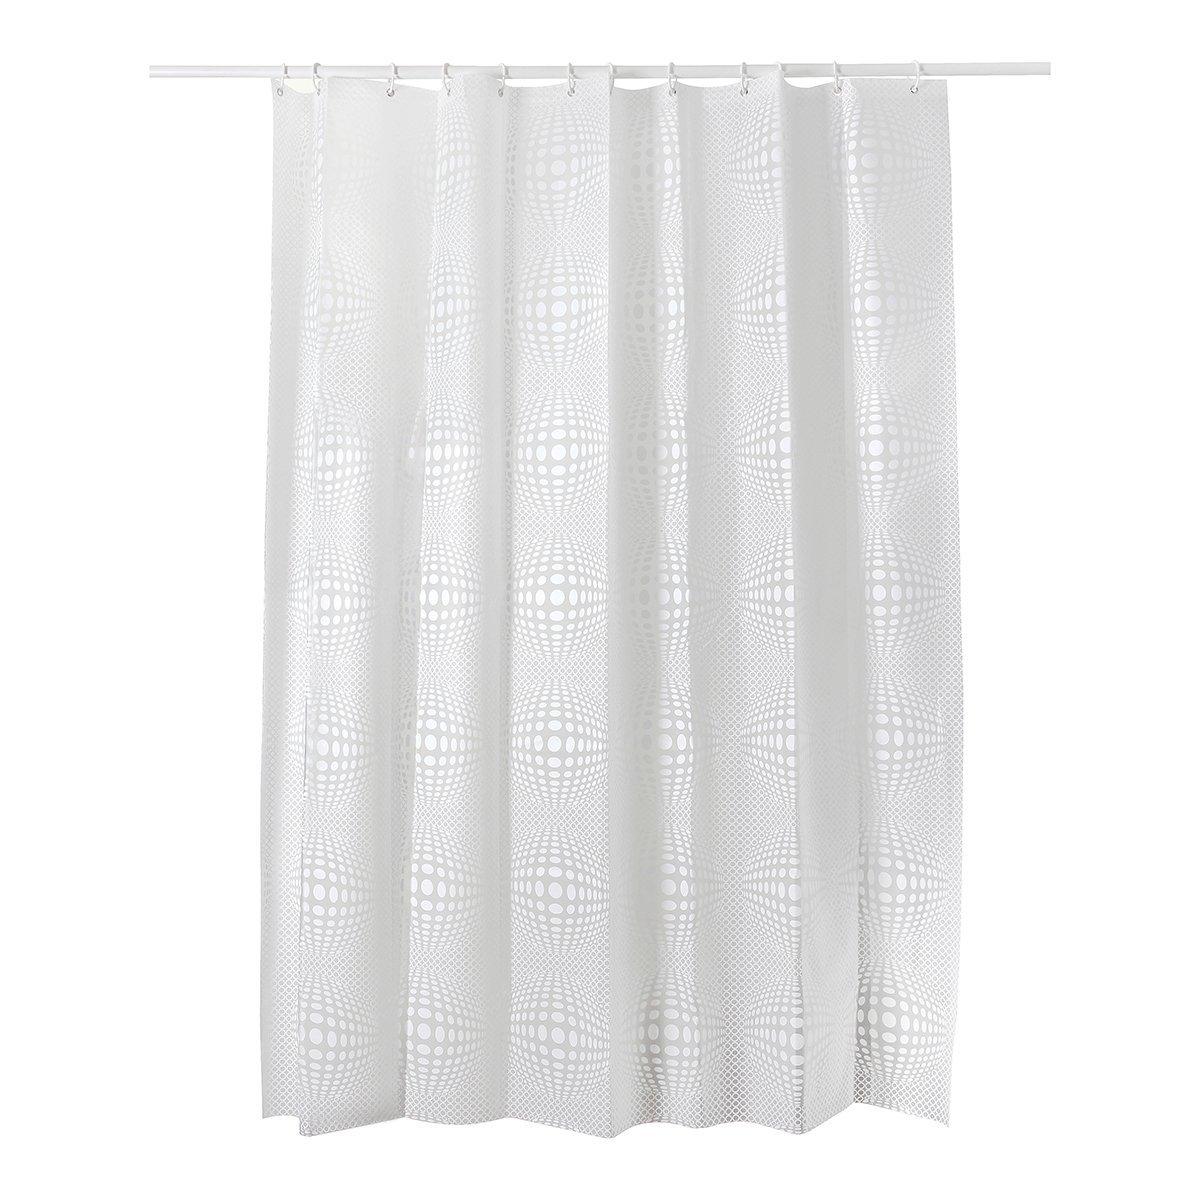 Healfit Mildew Resistant Shower Curtain Liners W Ith Hooks Waterproof Anti Bacterial 72X78